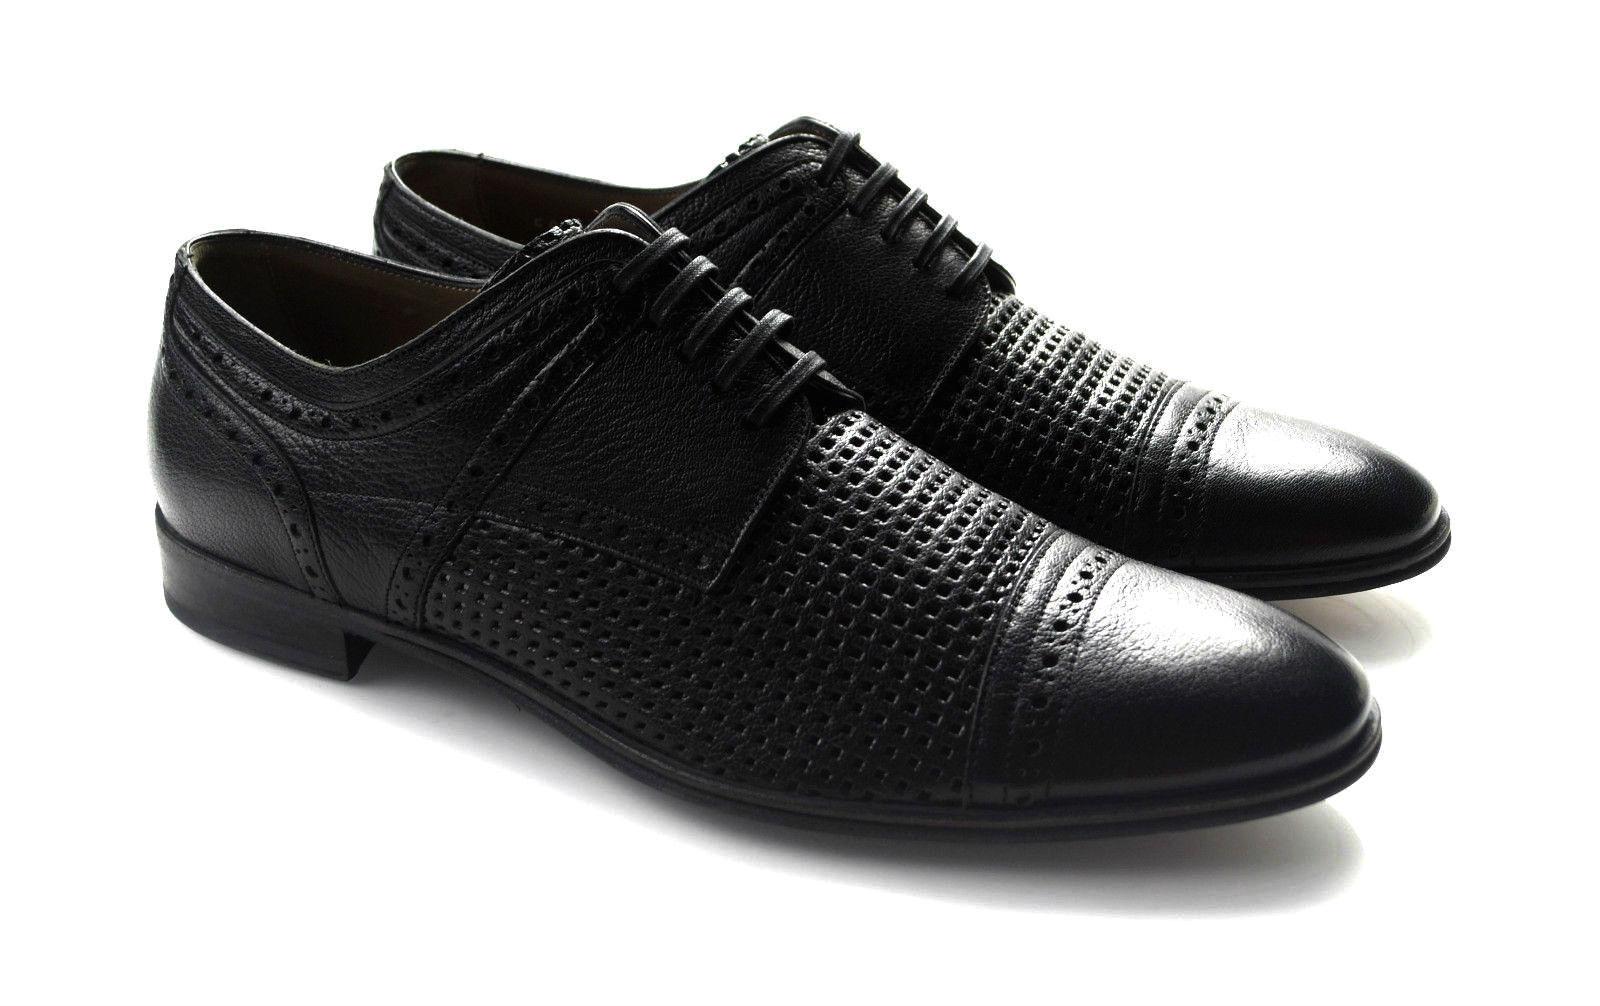 Dolce & Gabbana Lace Men's Schuhes Derby